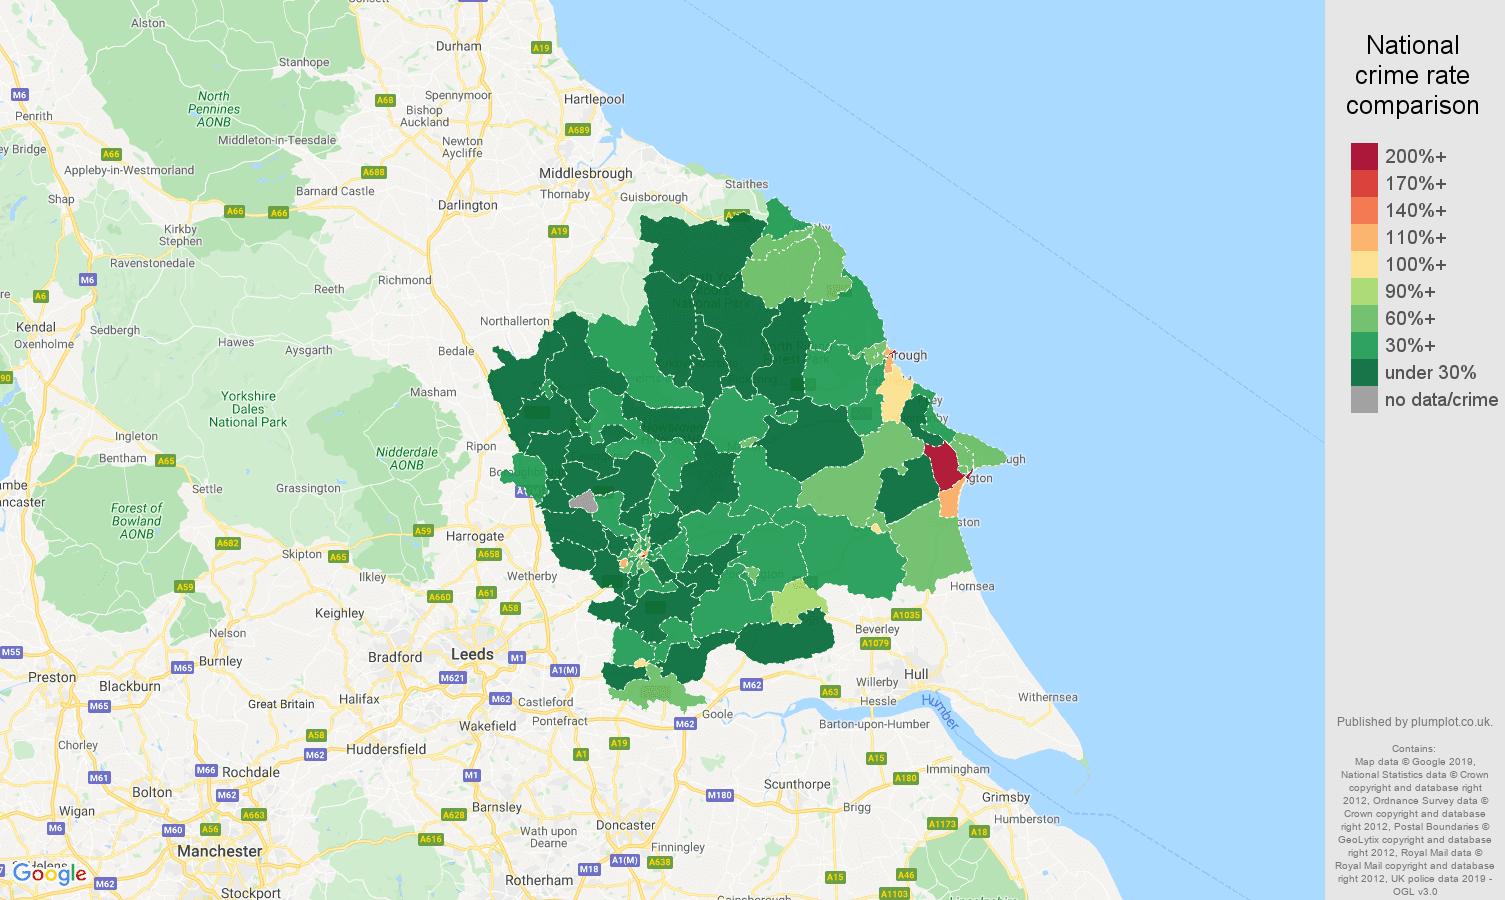 York public order crime rate comparison map